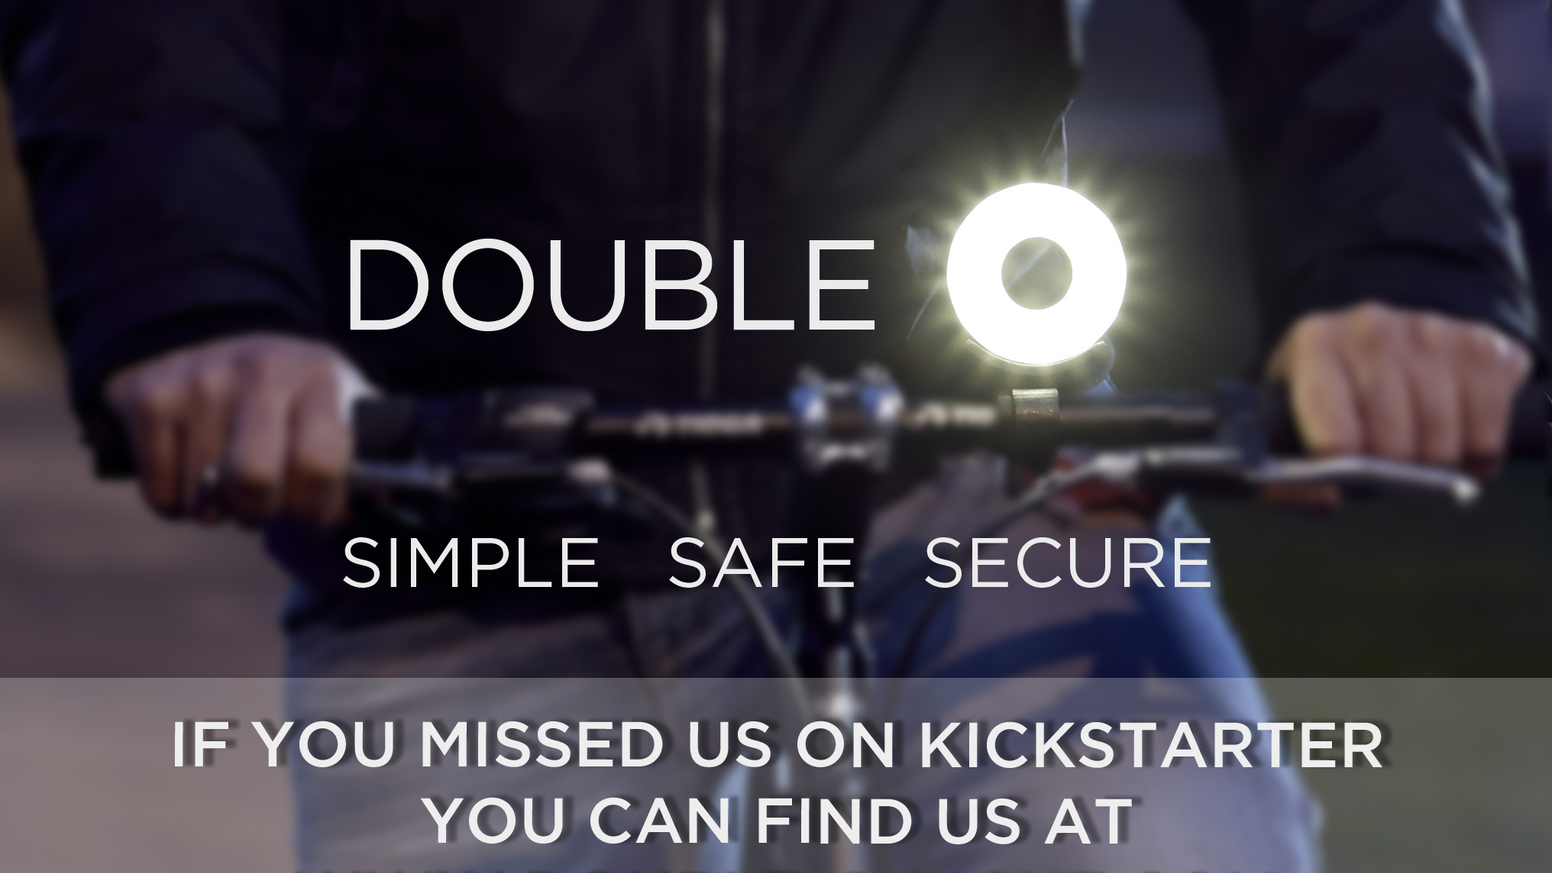 Double O A Simple Safe Secure Bike Light By Paul